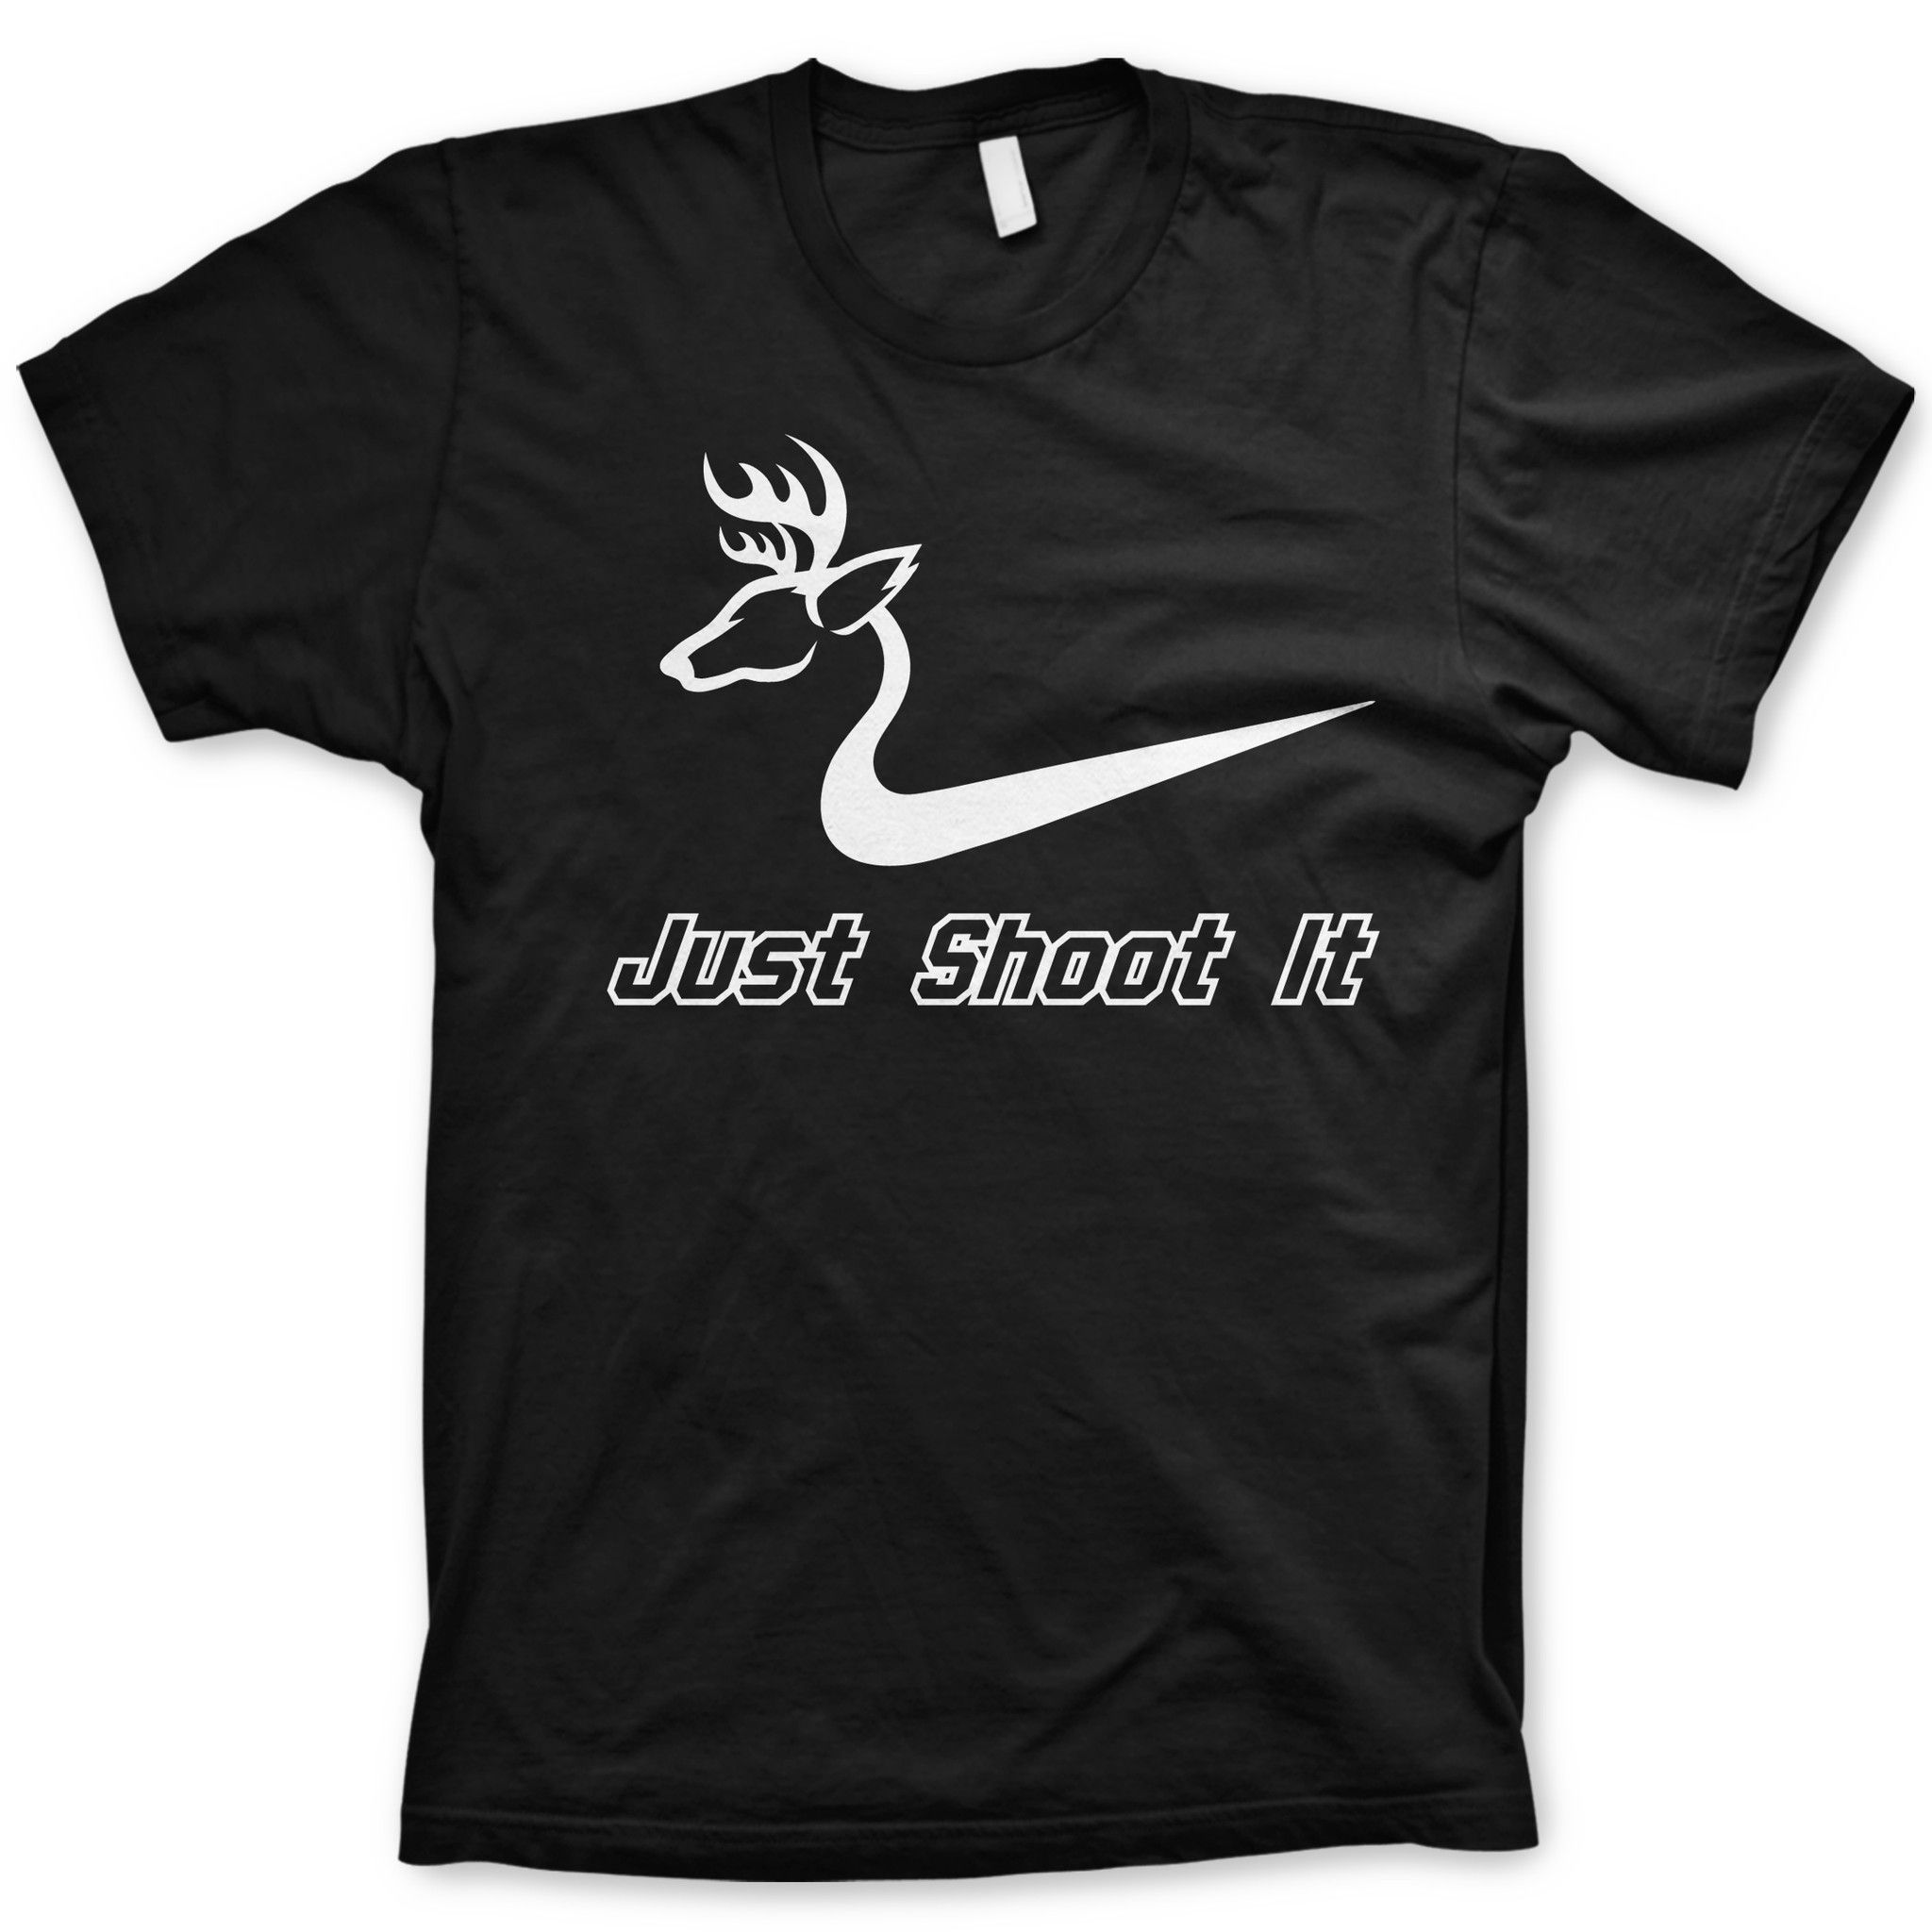 Funny Hunting Quotes Just Shoot It Shirt Funny Deer Hunting Tee  Funny Deer Deer